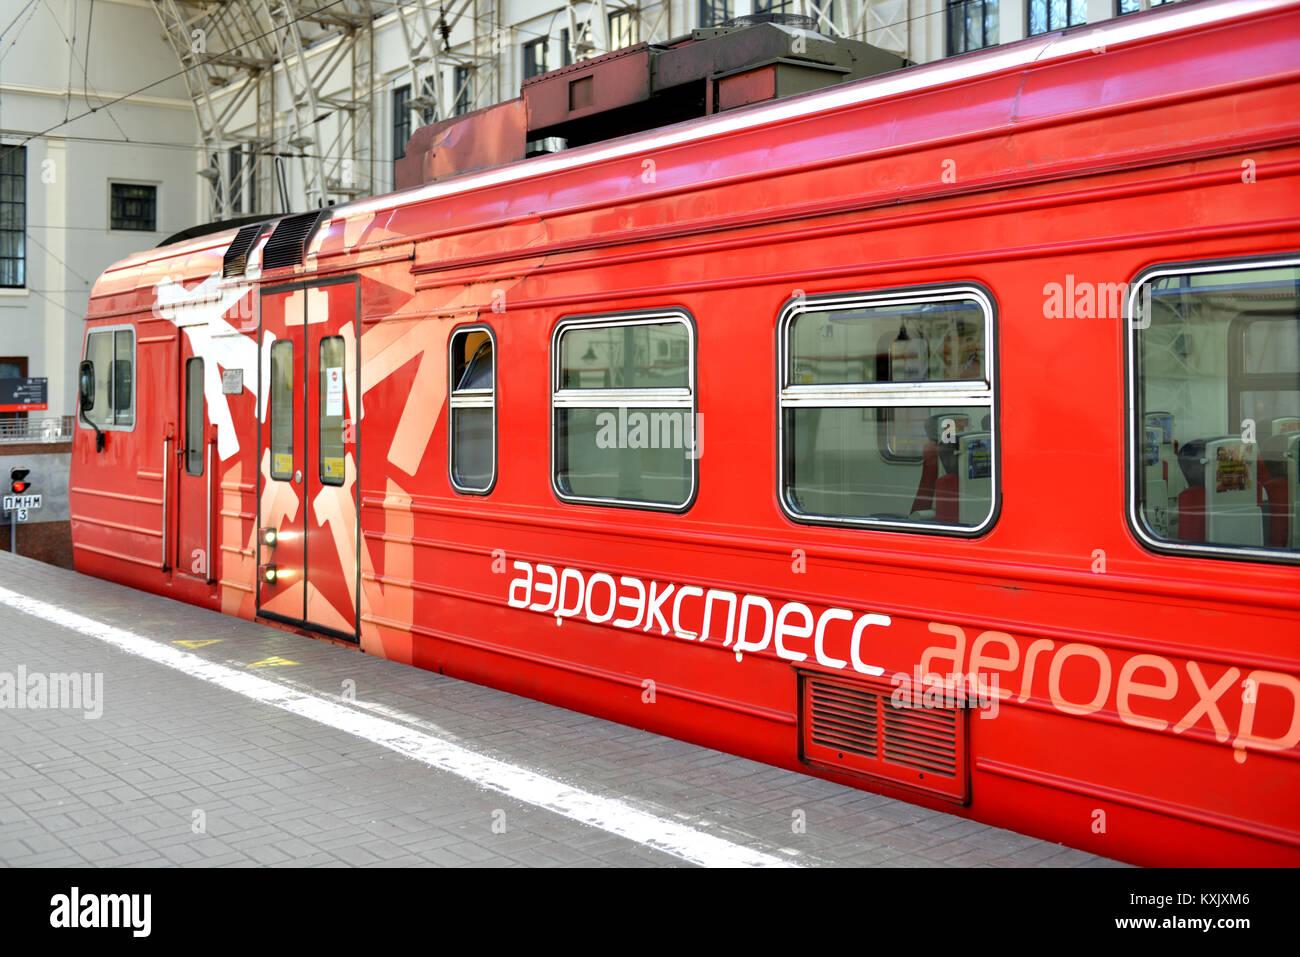 Aeroexpress train to Vnukovo airport at Kievskiy railway terminal. Platform - Stock Image